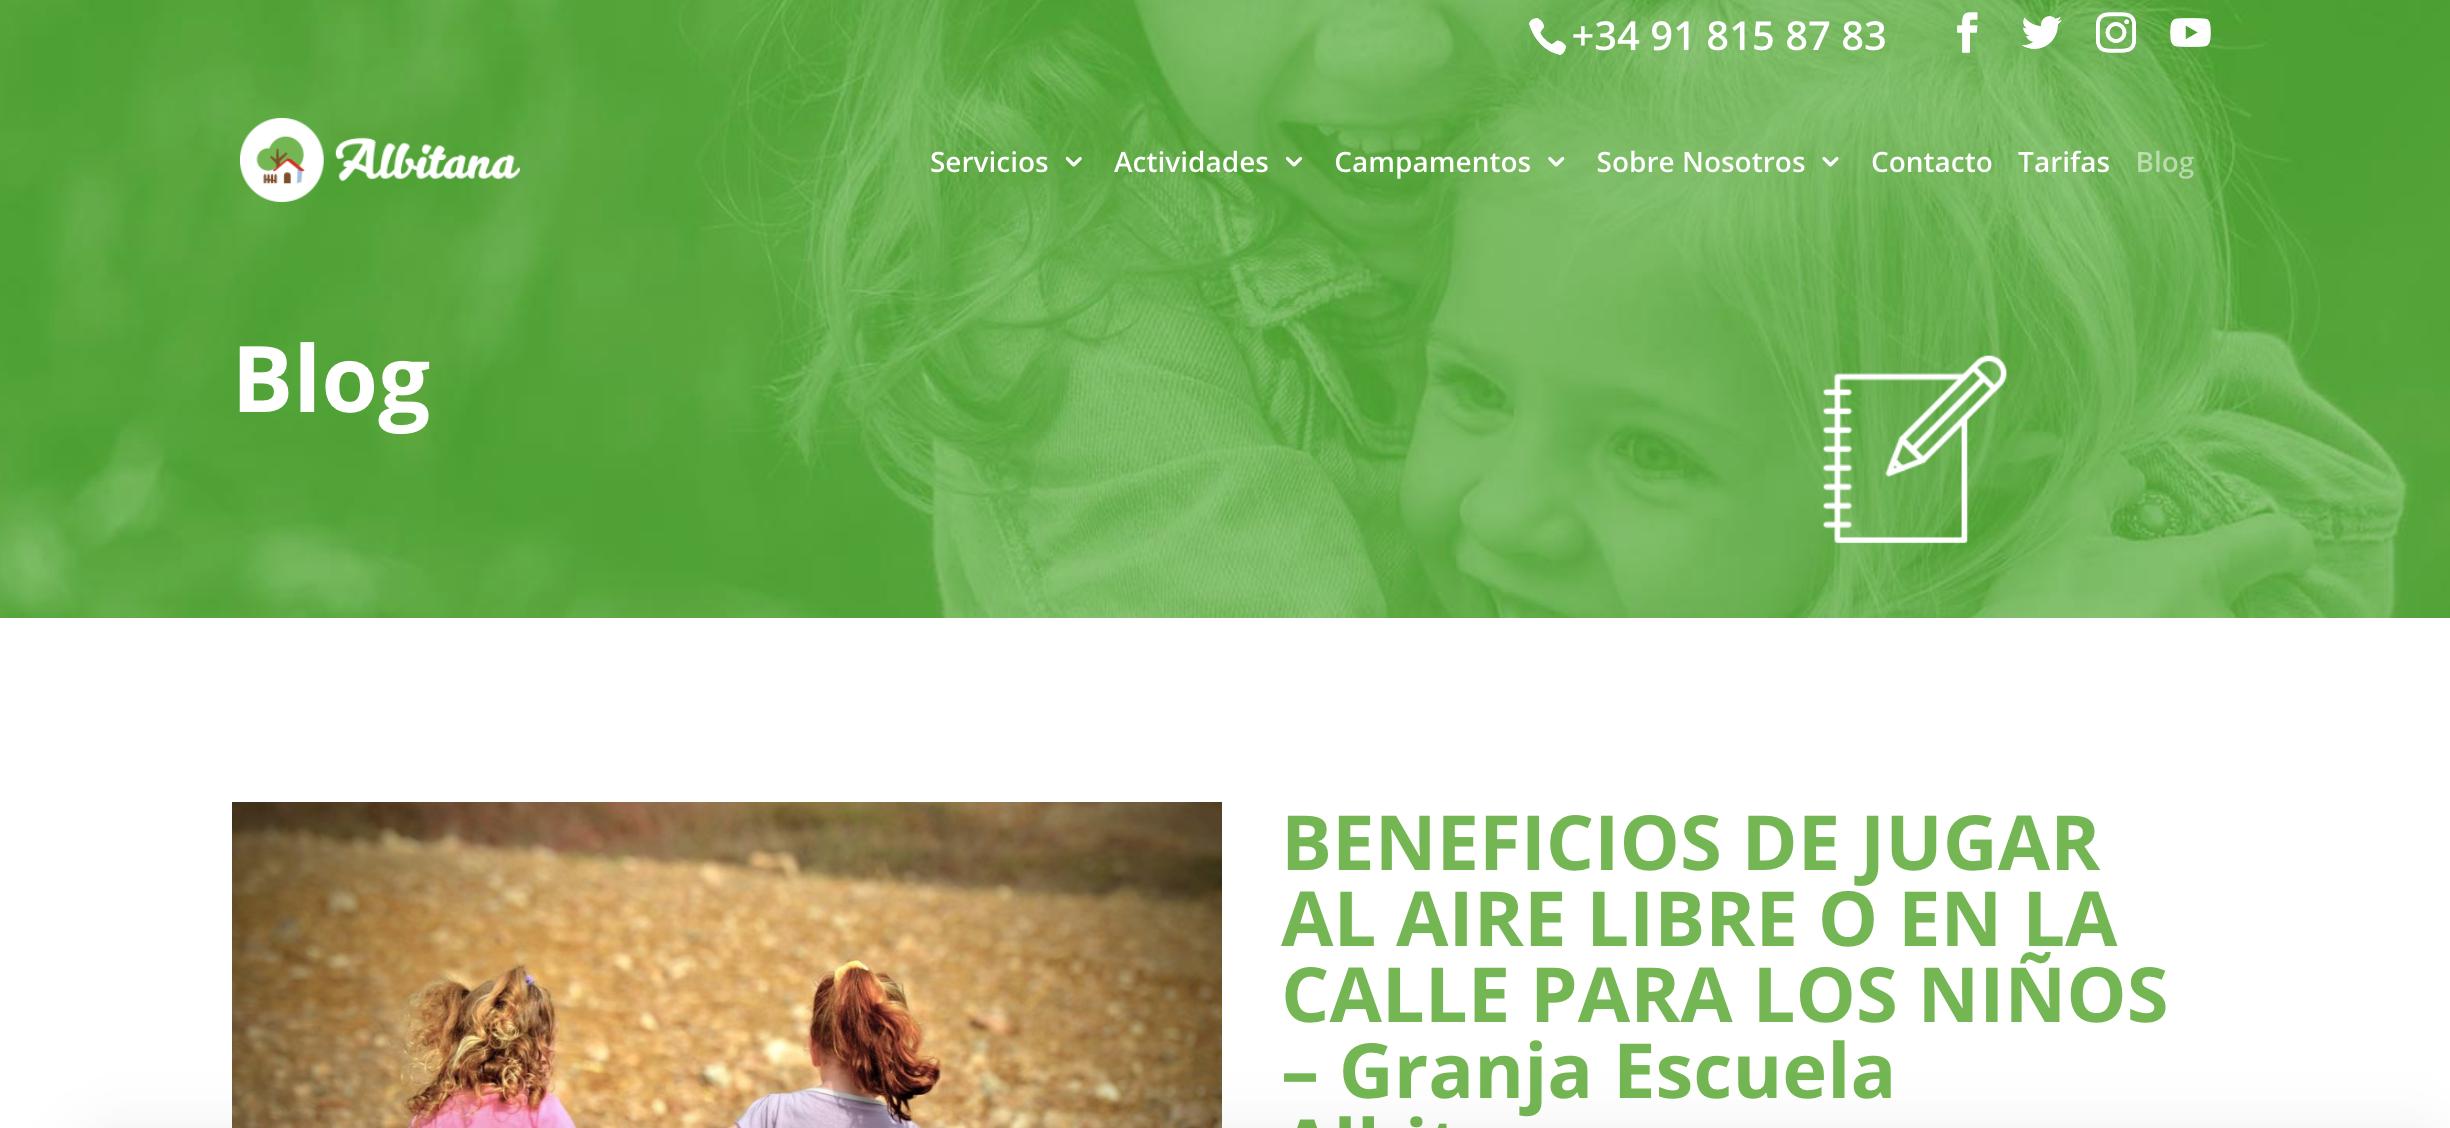 nuevo blog granja escuela albitana